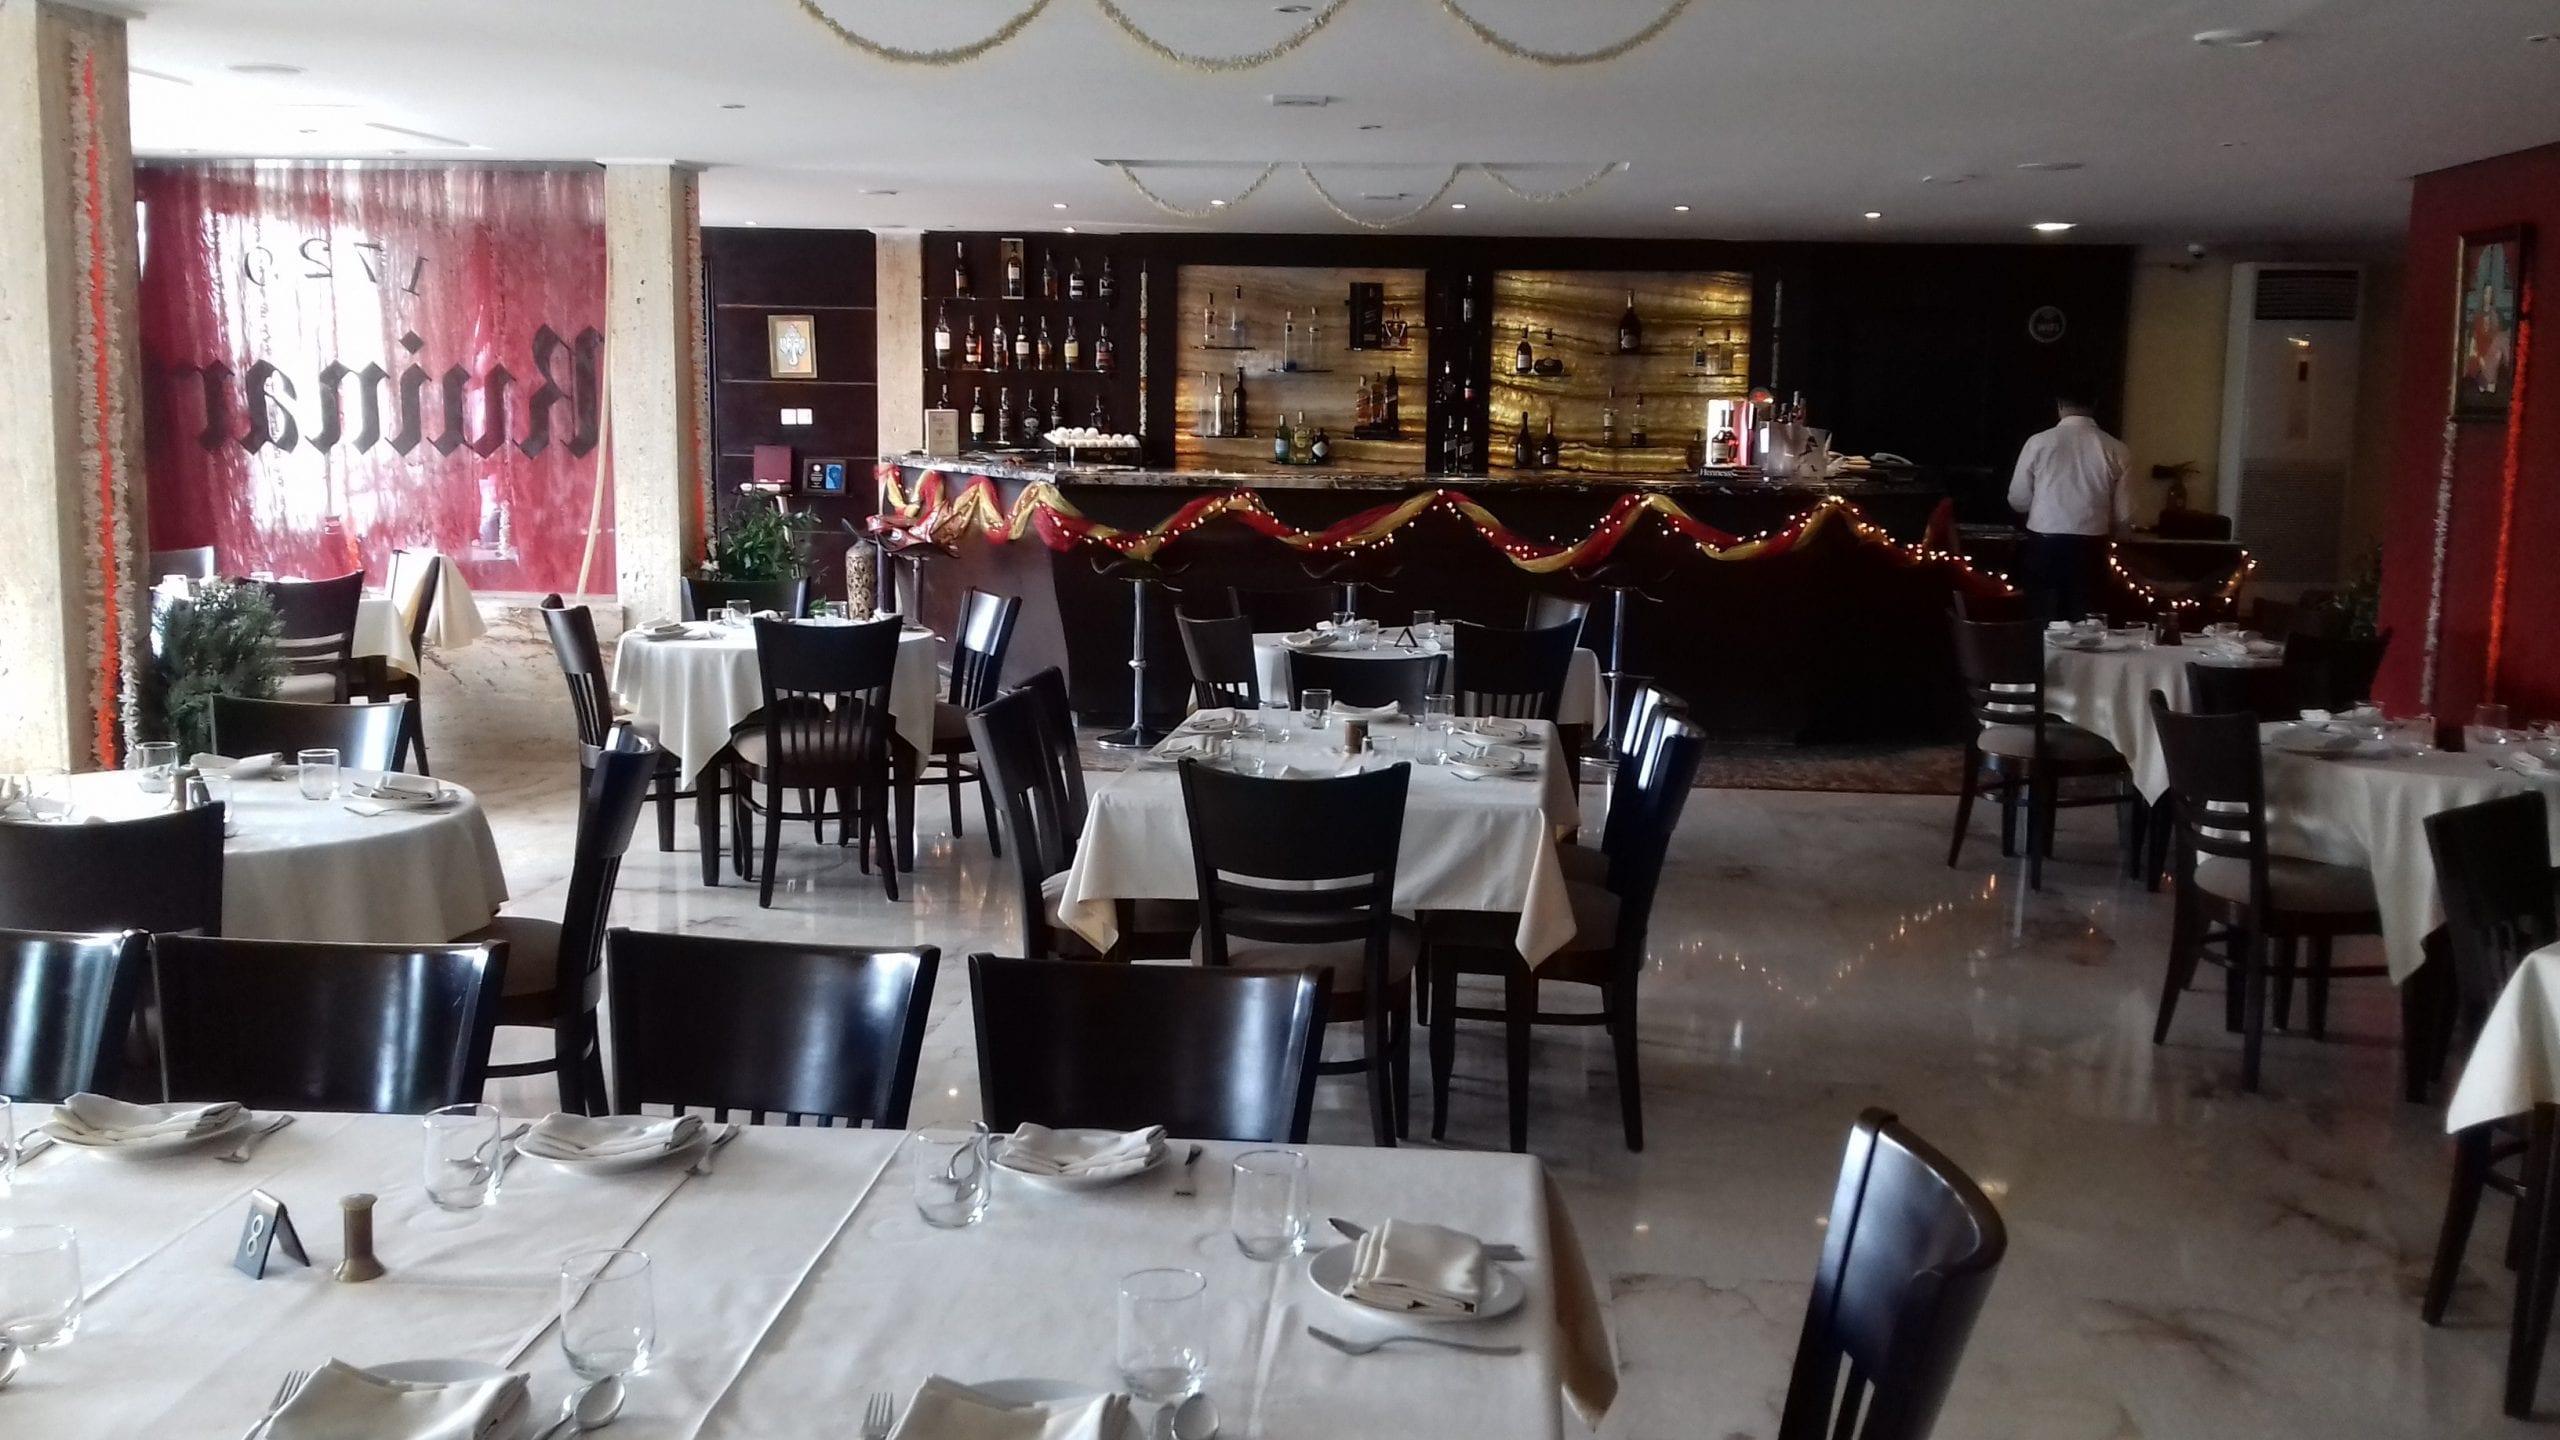 Bombay Masala 10 Top Restaurants in Douala